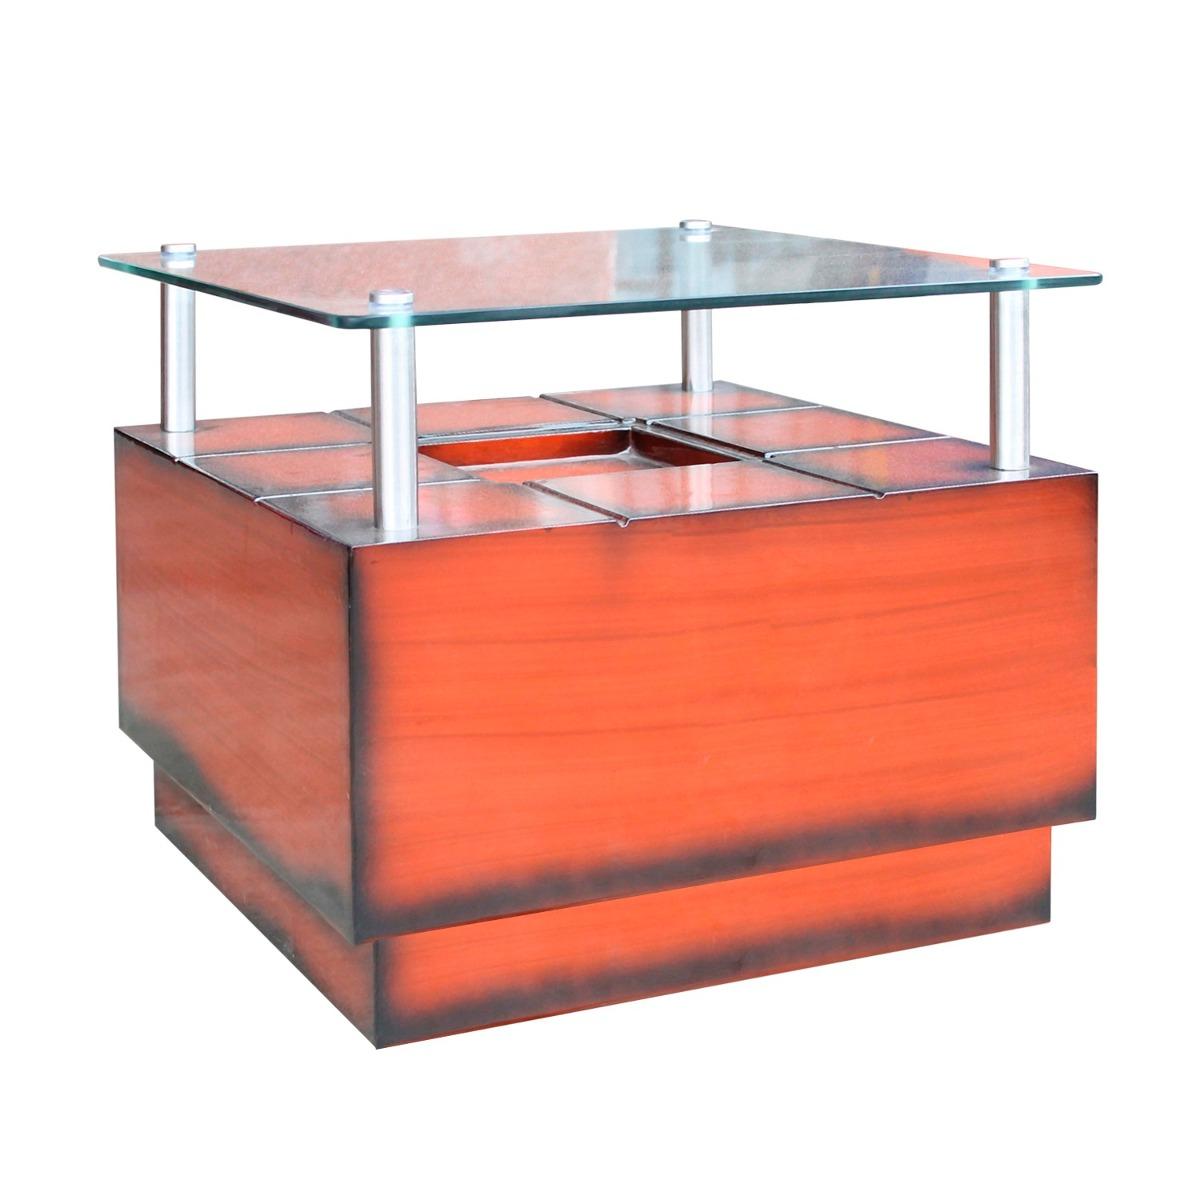 Mueble mesa de centro sala living modelo square s 189 for Centro mueble